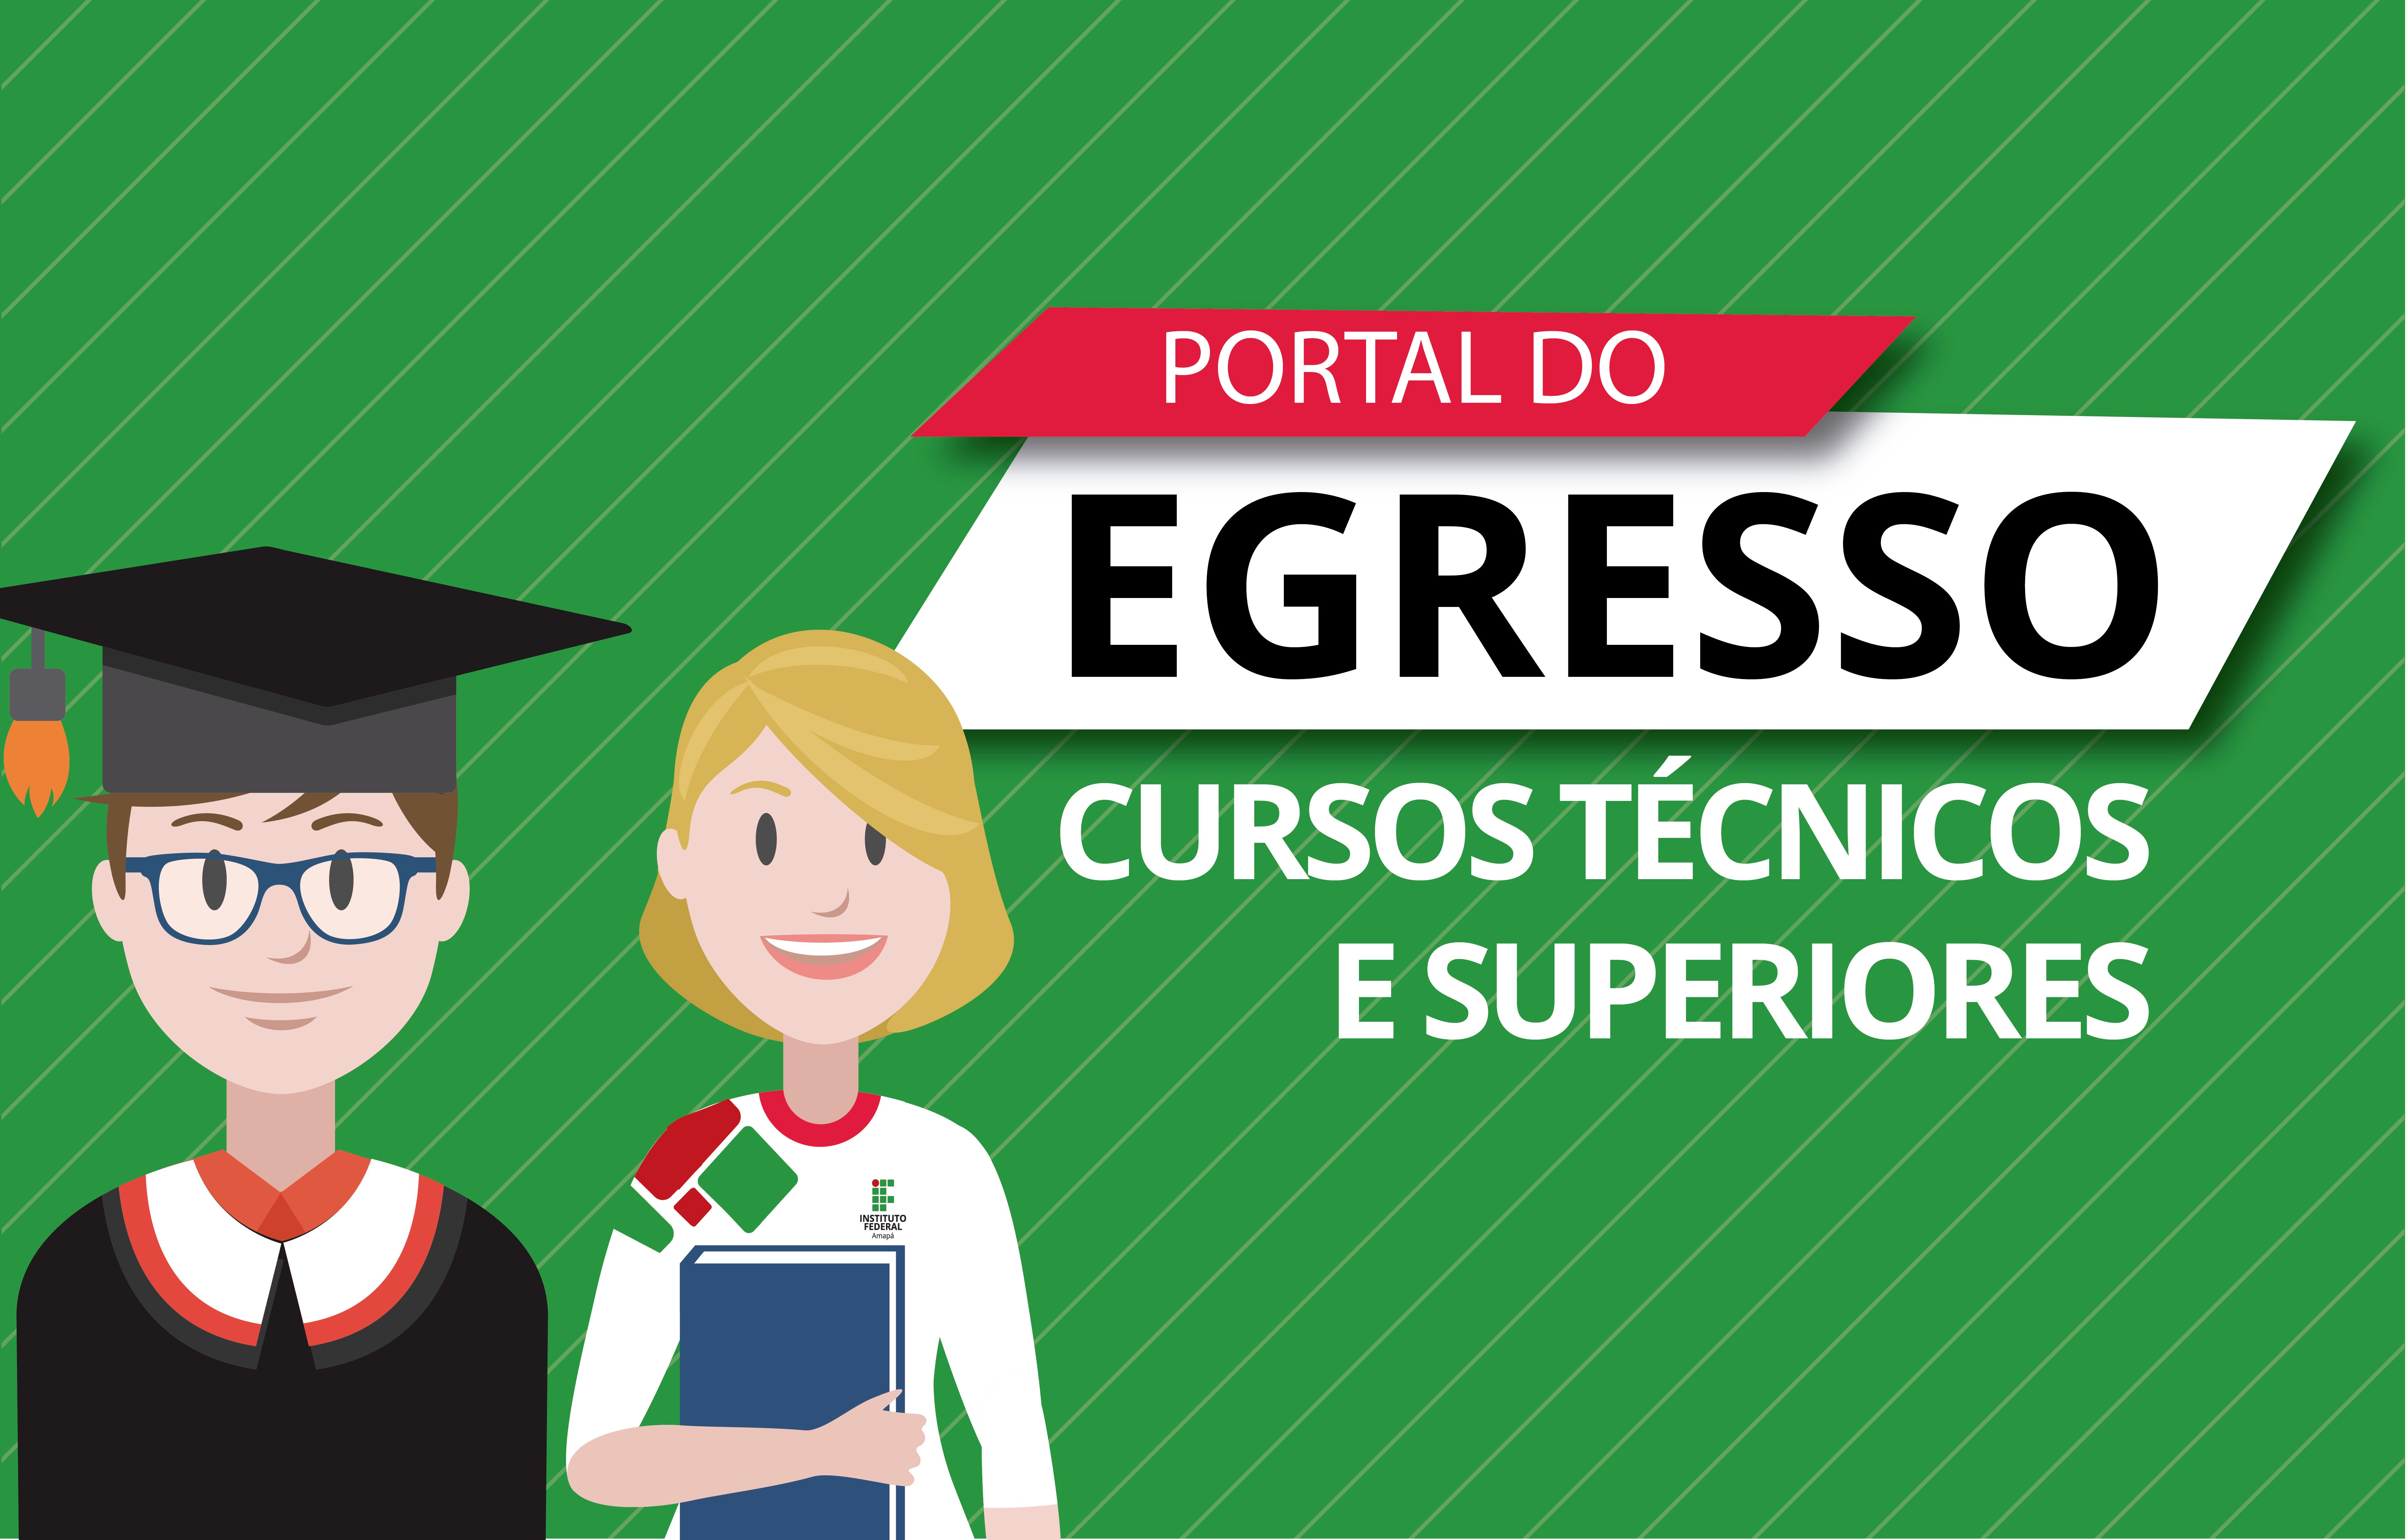 Ifap implanta Portal do Egresso